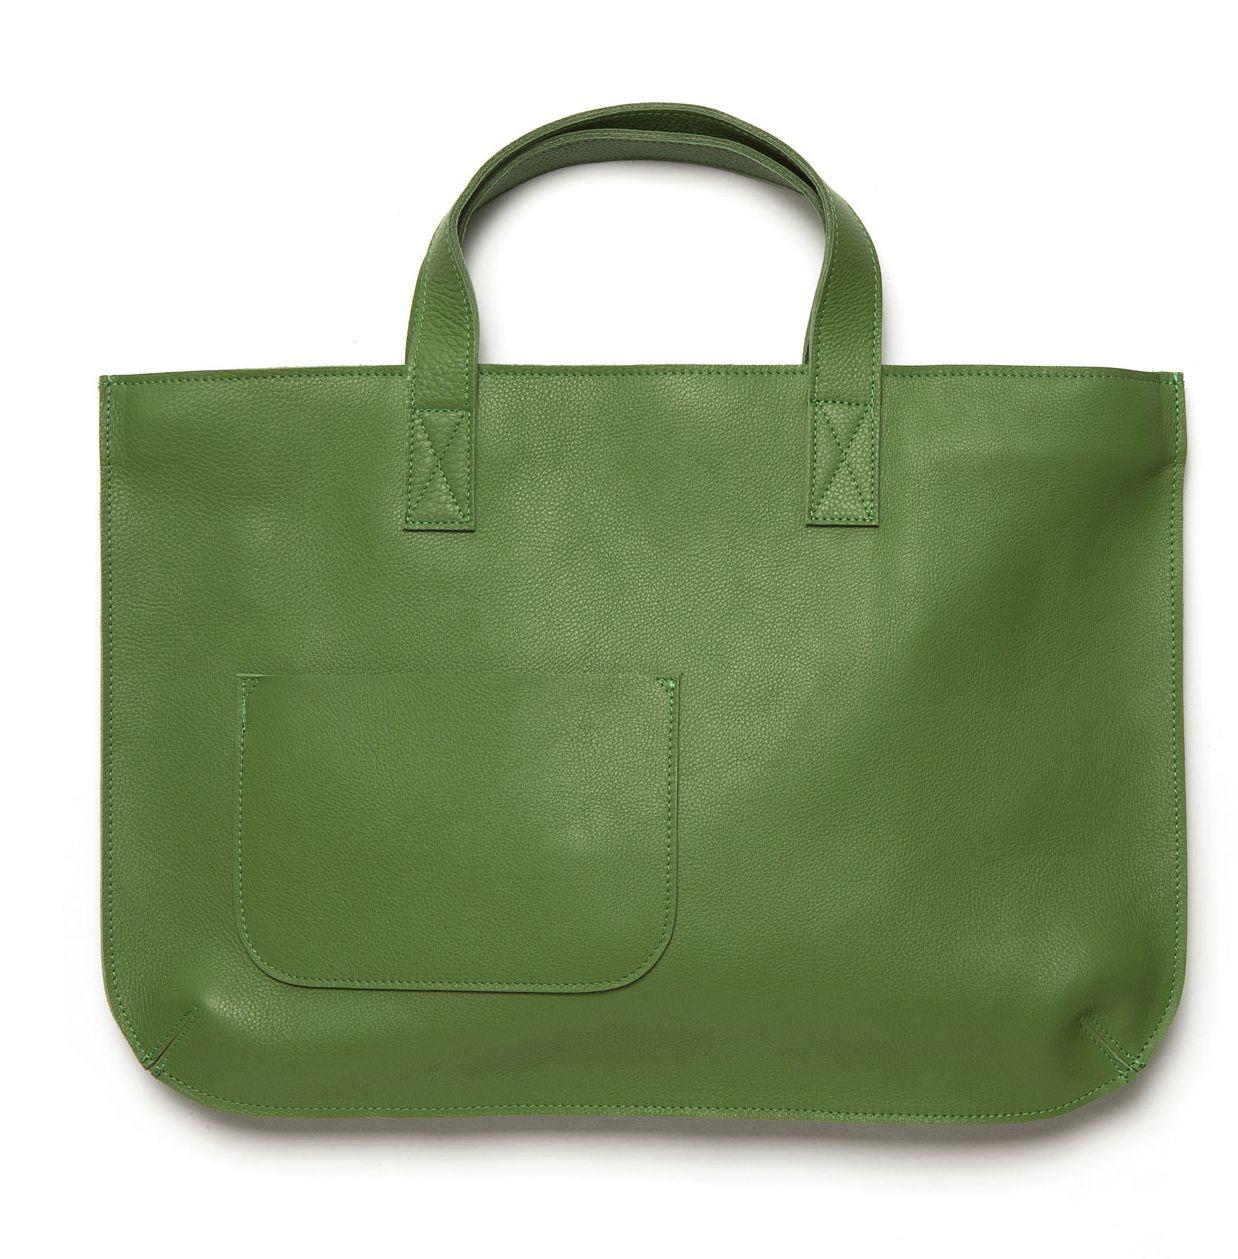 3bb594af2b Bag Elephant Joke Fresh Green - Keecie - BijzonderMOOI  Dutch design online  Fresh Green